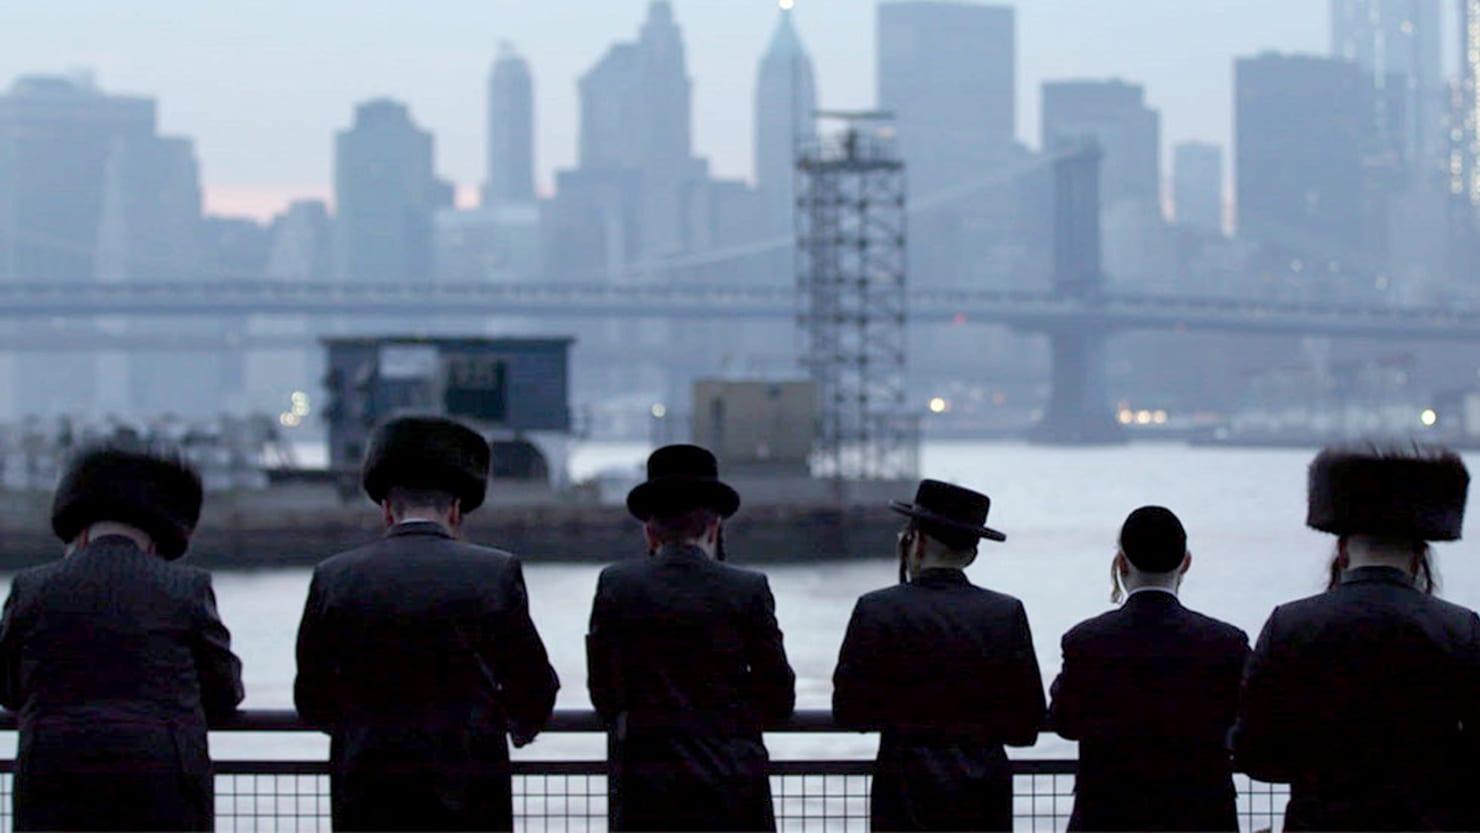 The Terror of Escaping New York's Hasidic Community